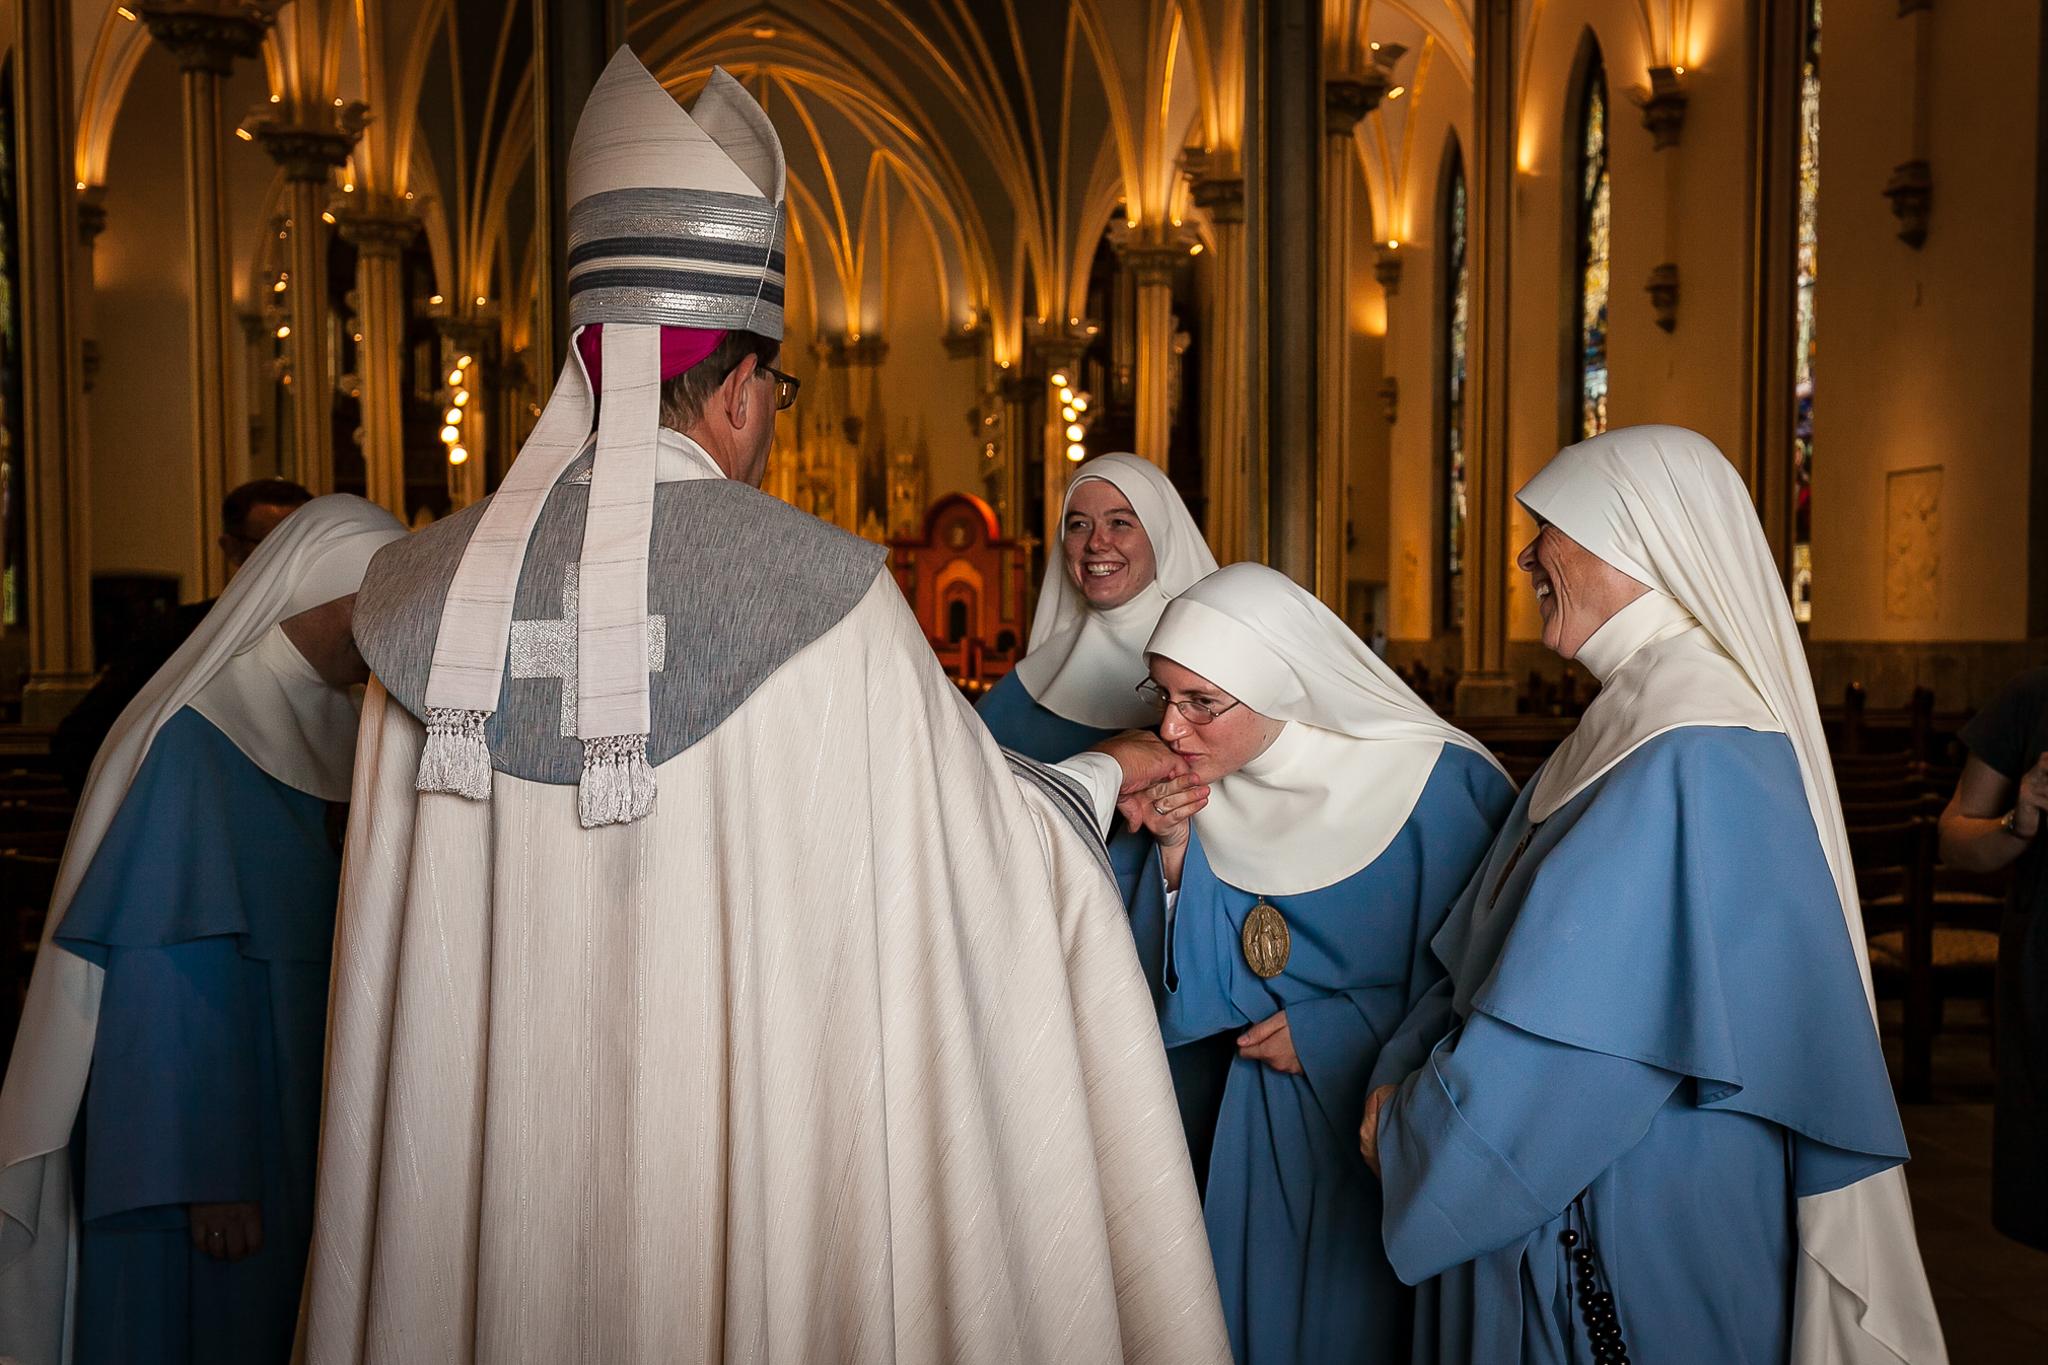 bishop_nuns.jpg